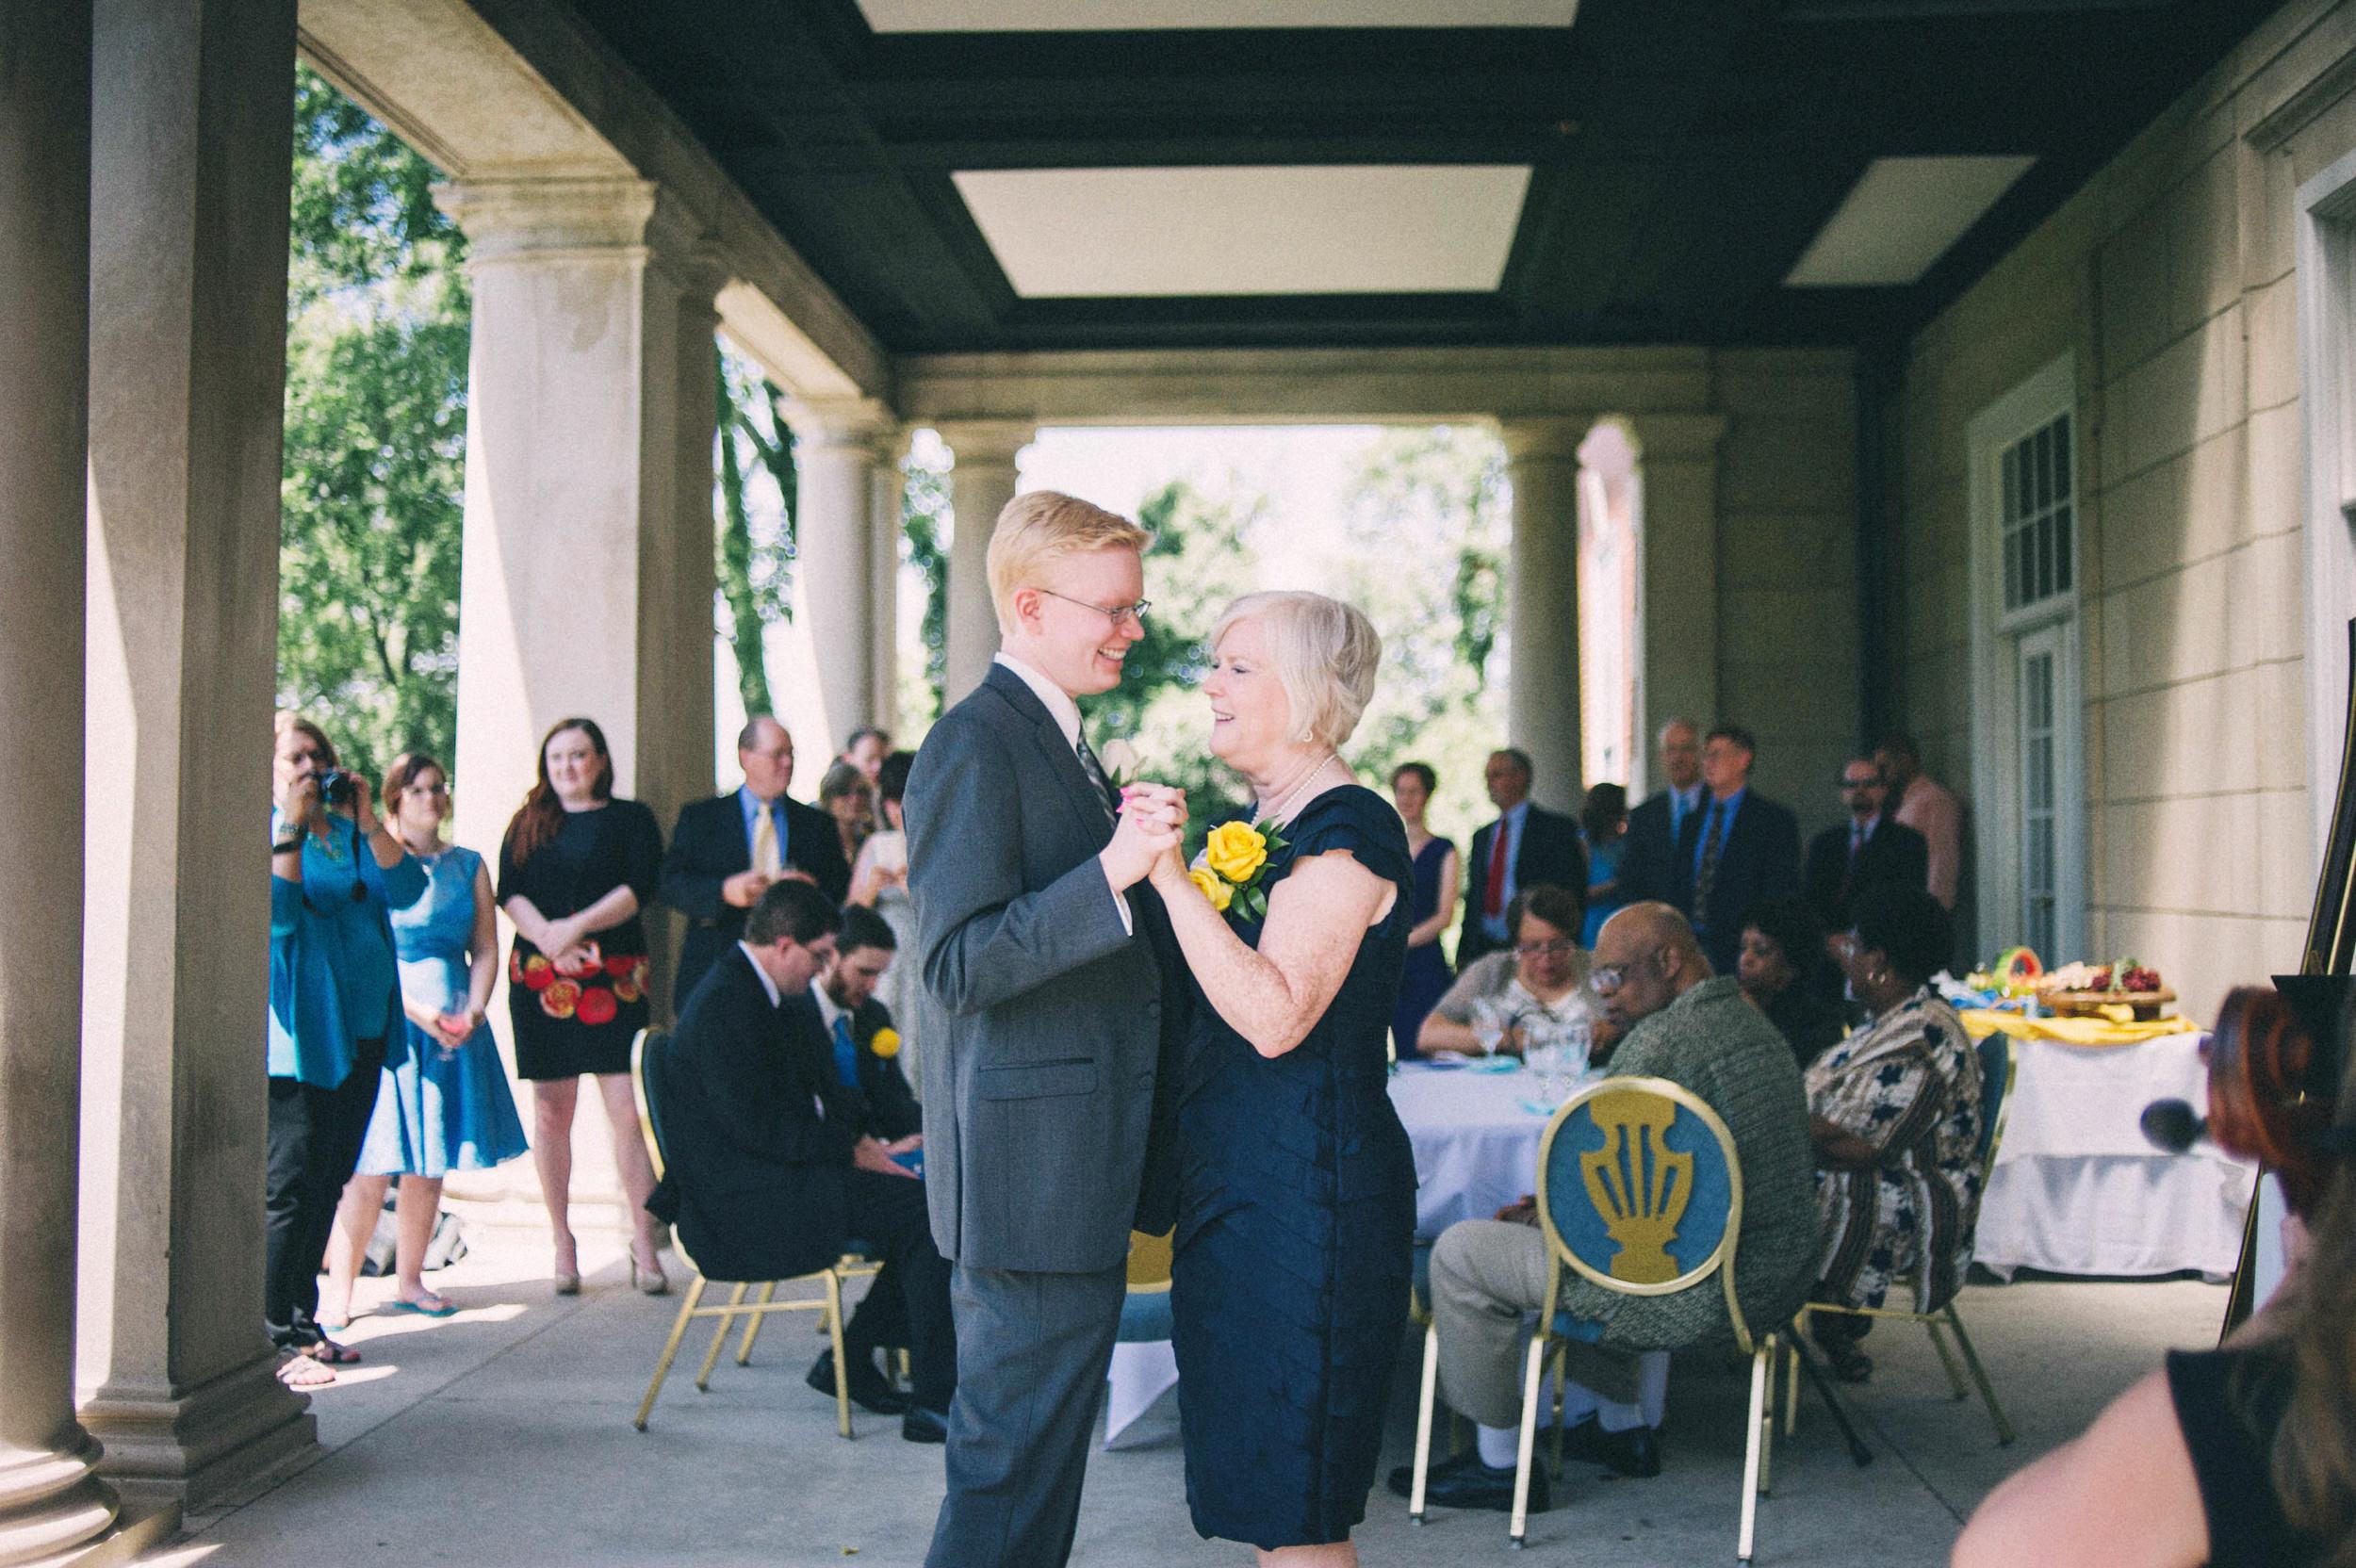 Jenna-Patrick-Garden-Court-Presbyterian-Seminary-Wedding-Louisville-Kentucky-Sarah-Katherine-Davis-Photography-68.jpg